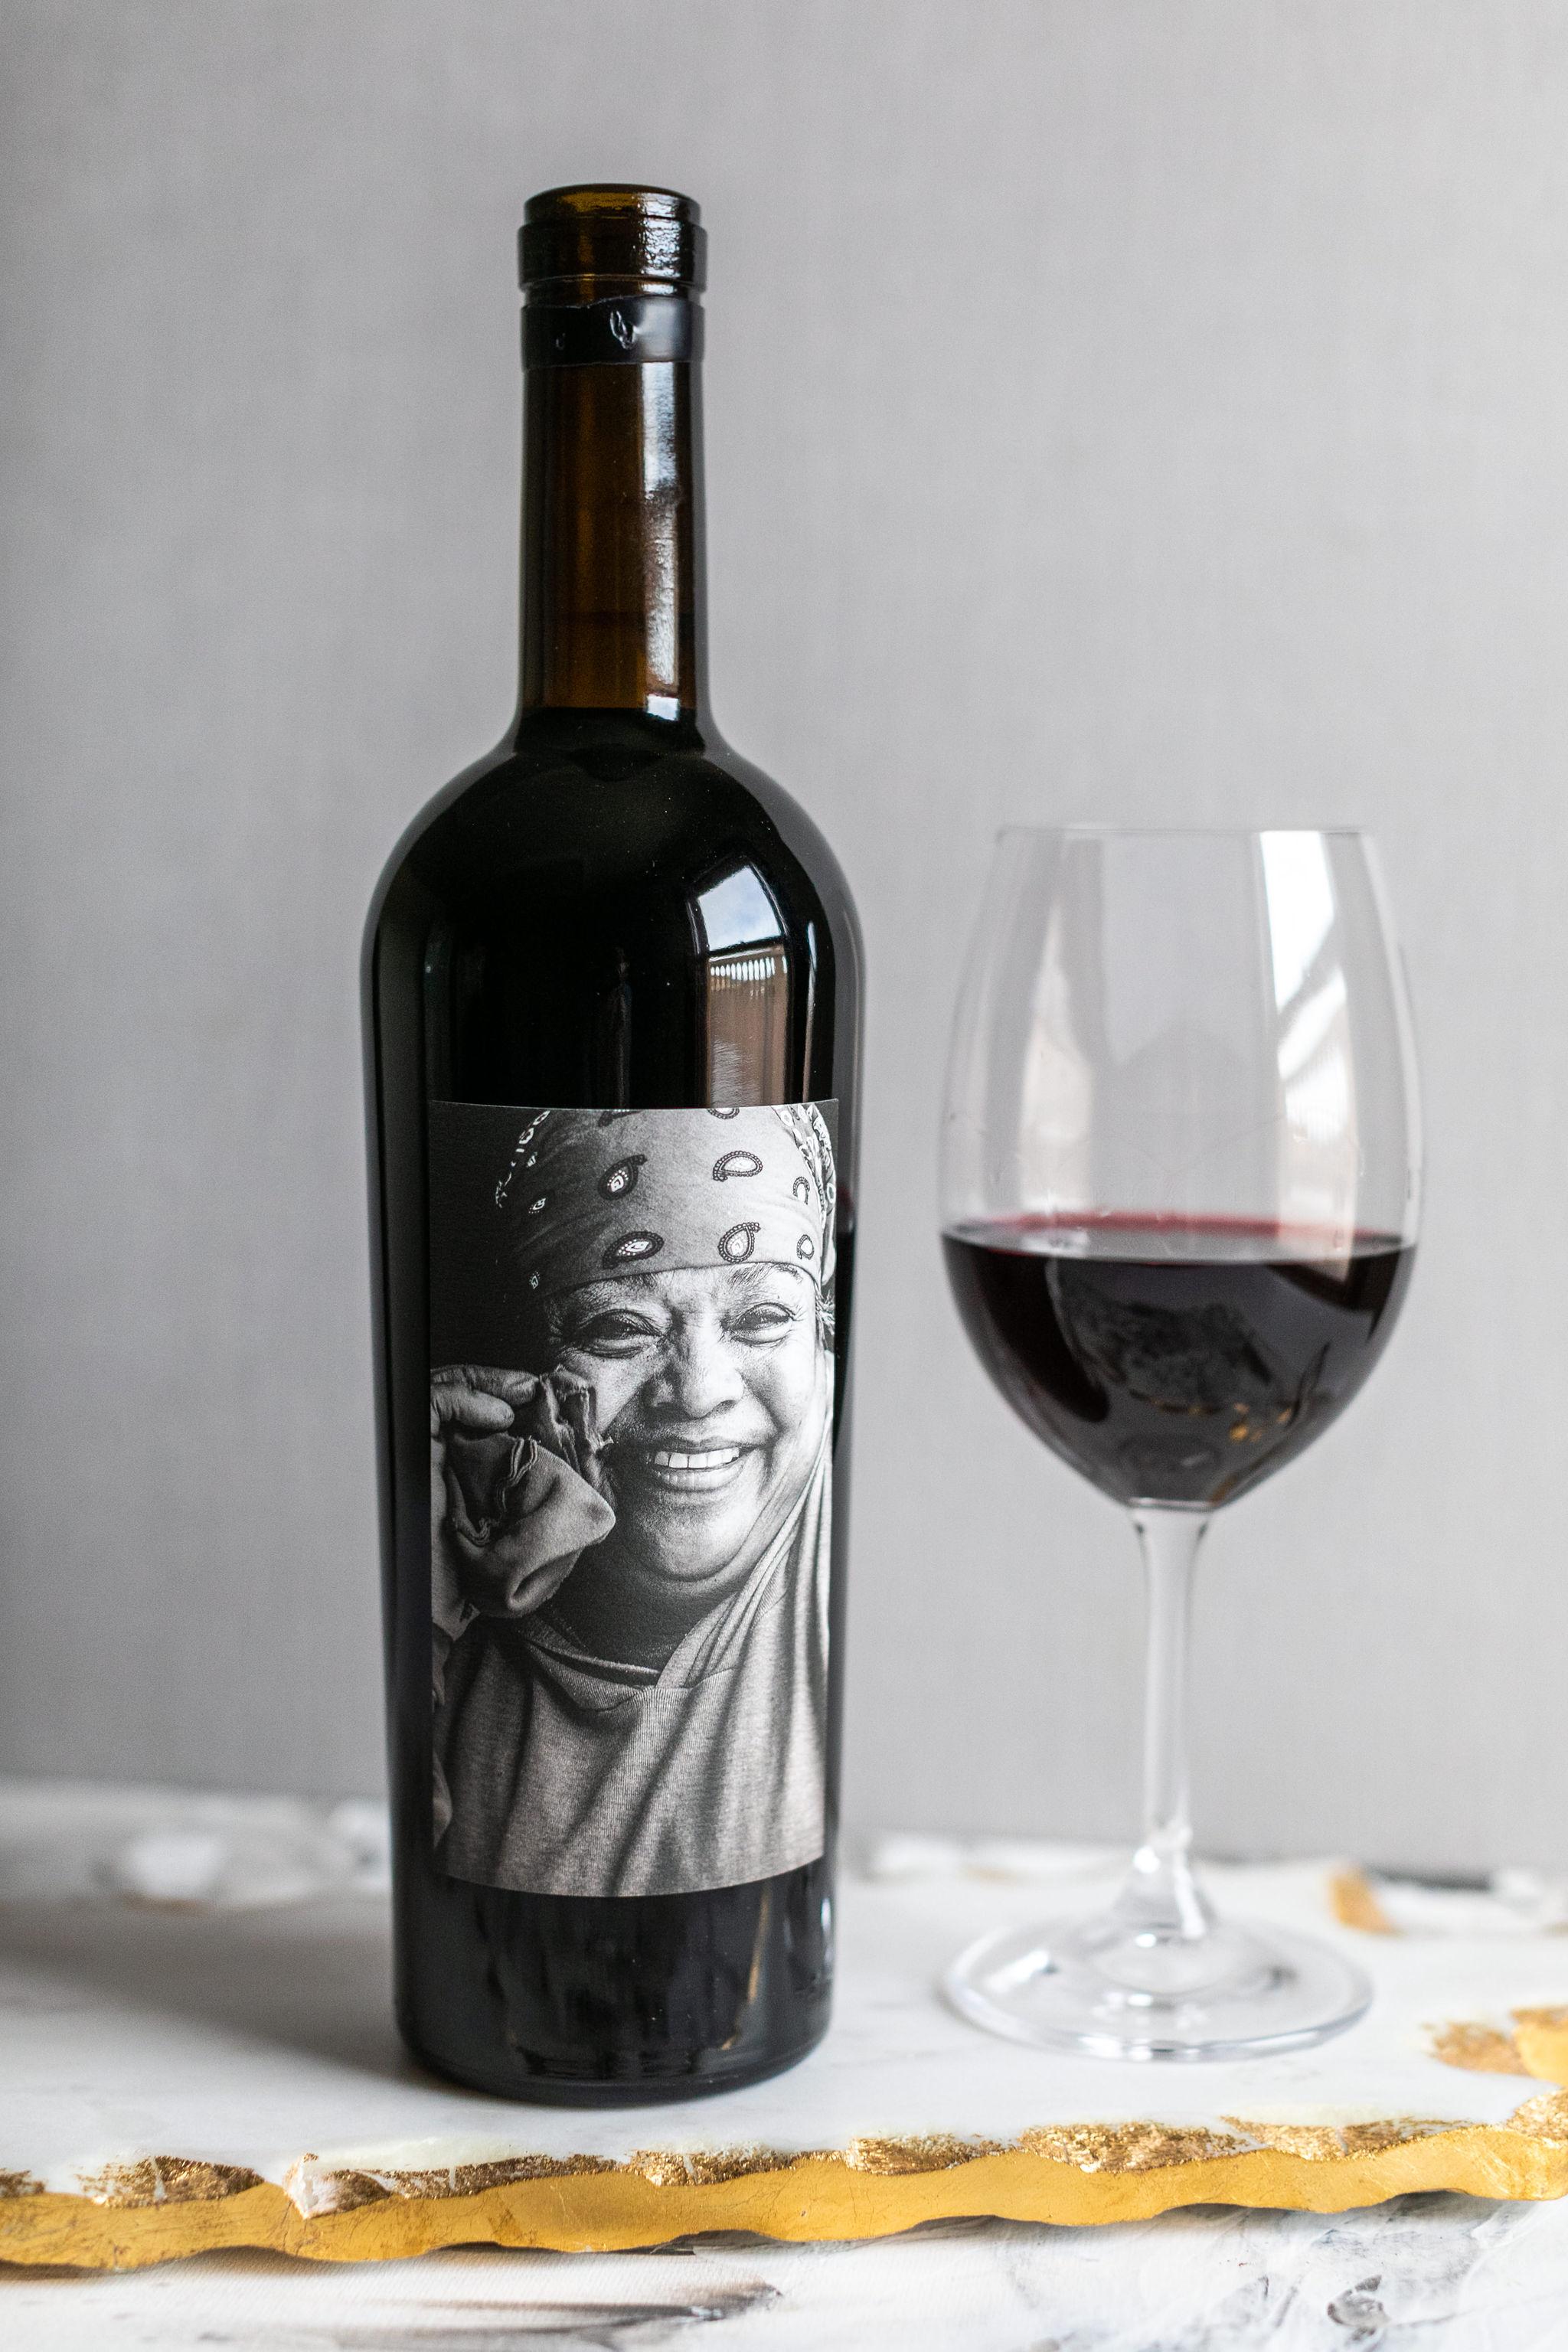 acacia_productions-wine_speak-2019-0311.jpg